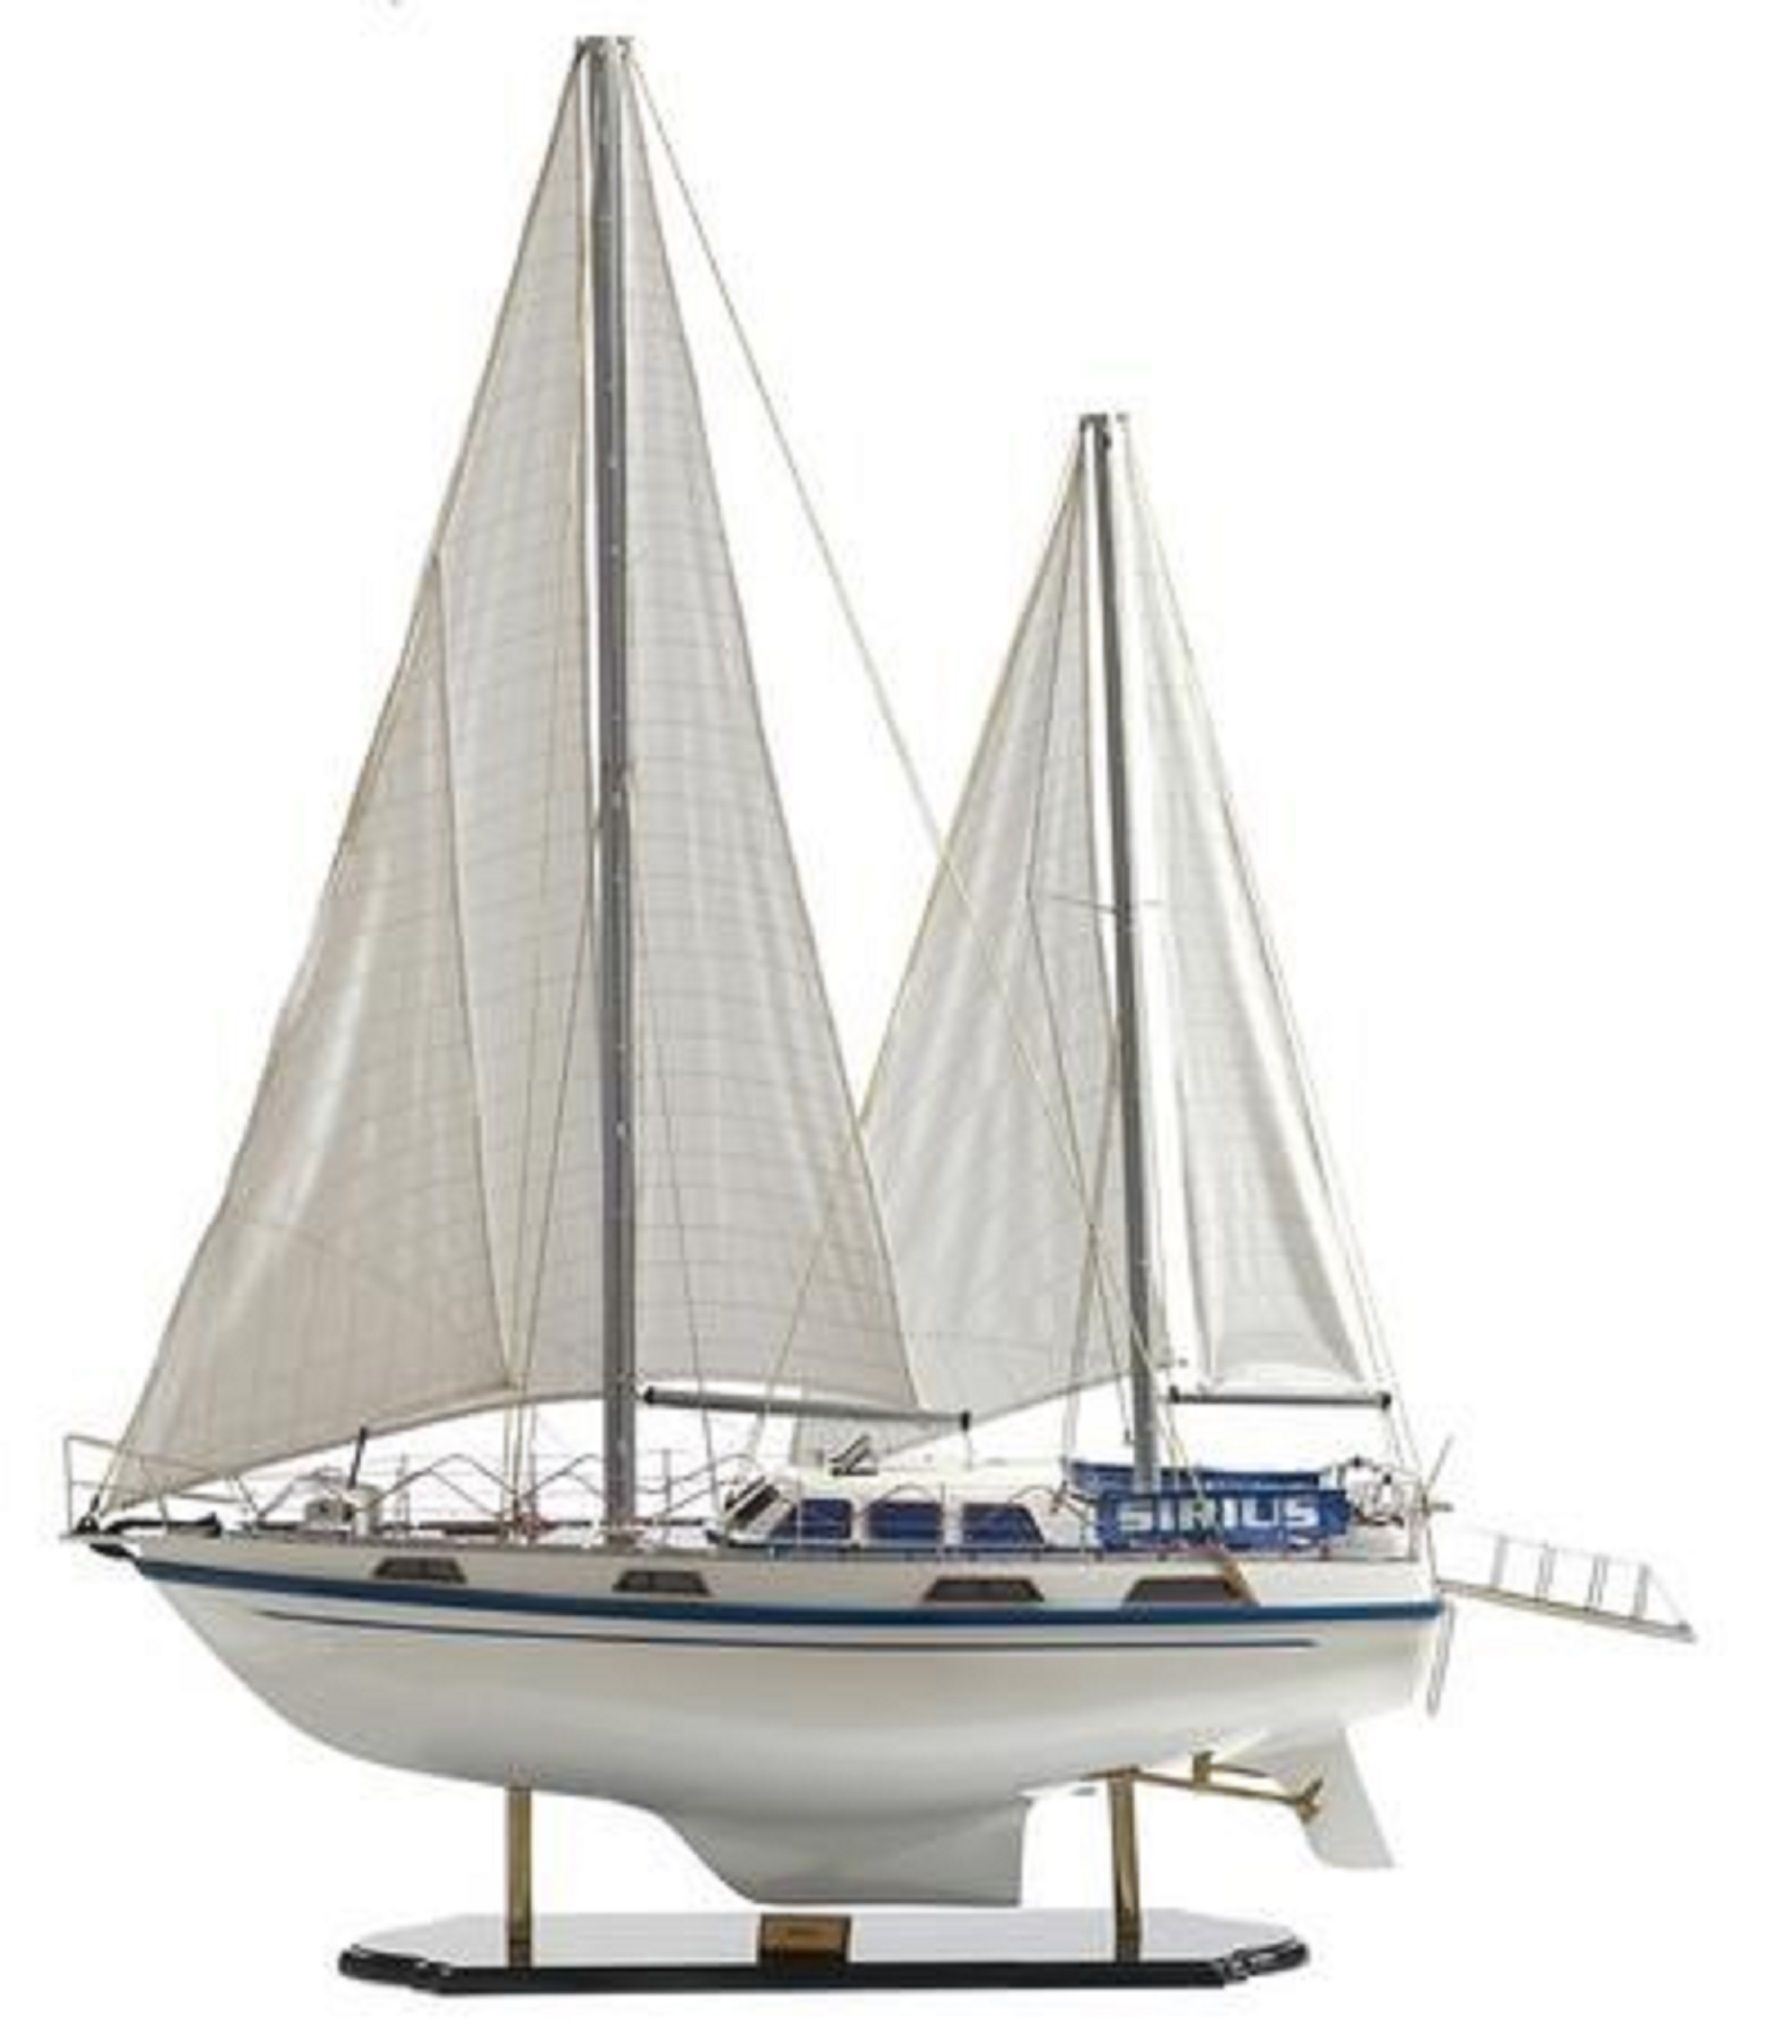 164-6835-Colvic-Victor-40-model-yacht